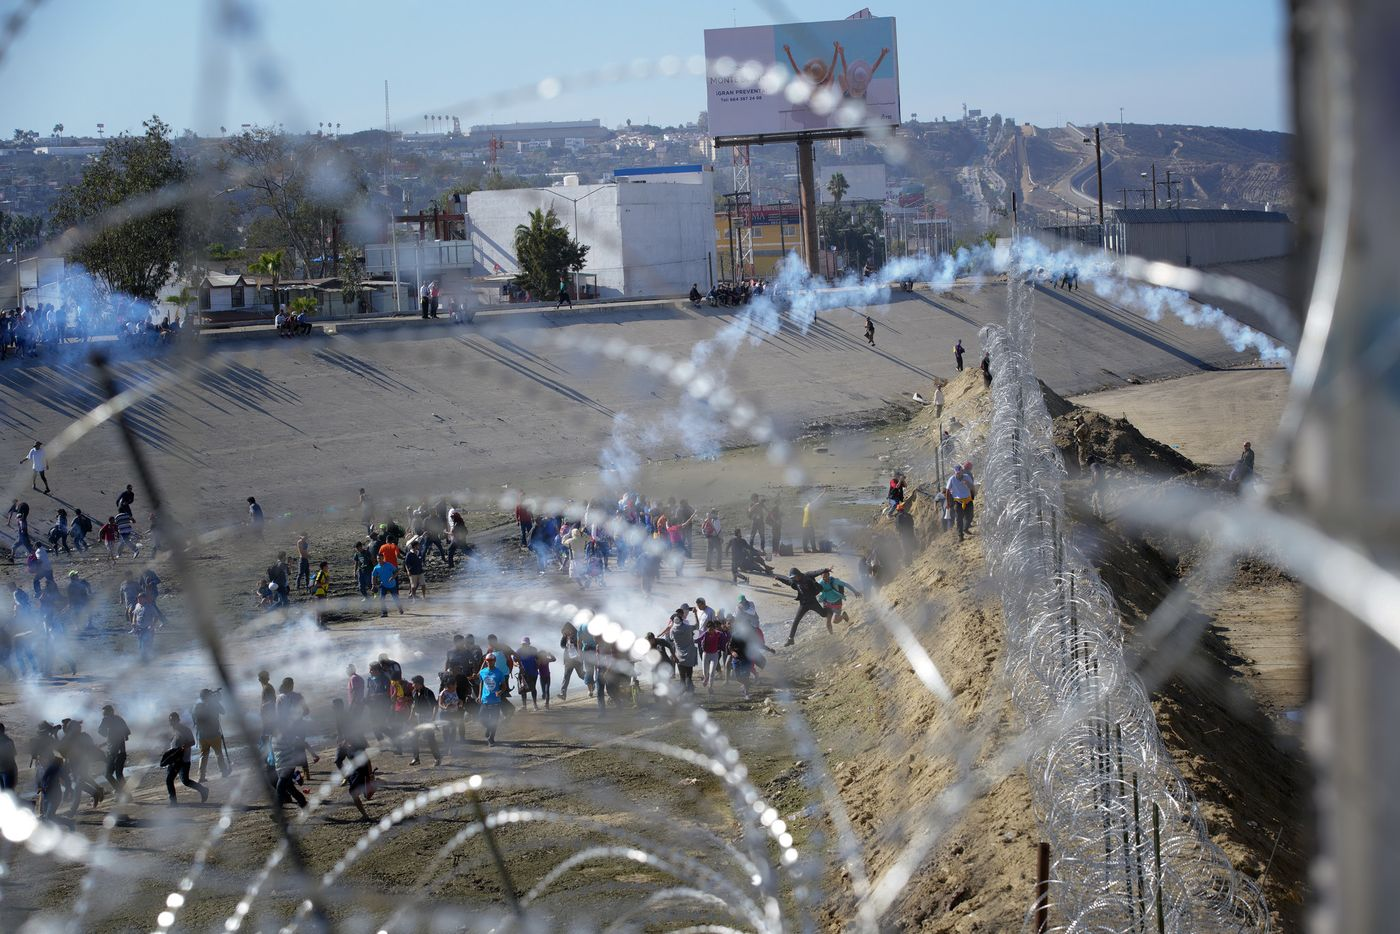 sd-pg-migrant-caravan-reaches-border-san-ysidr-019.jpg